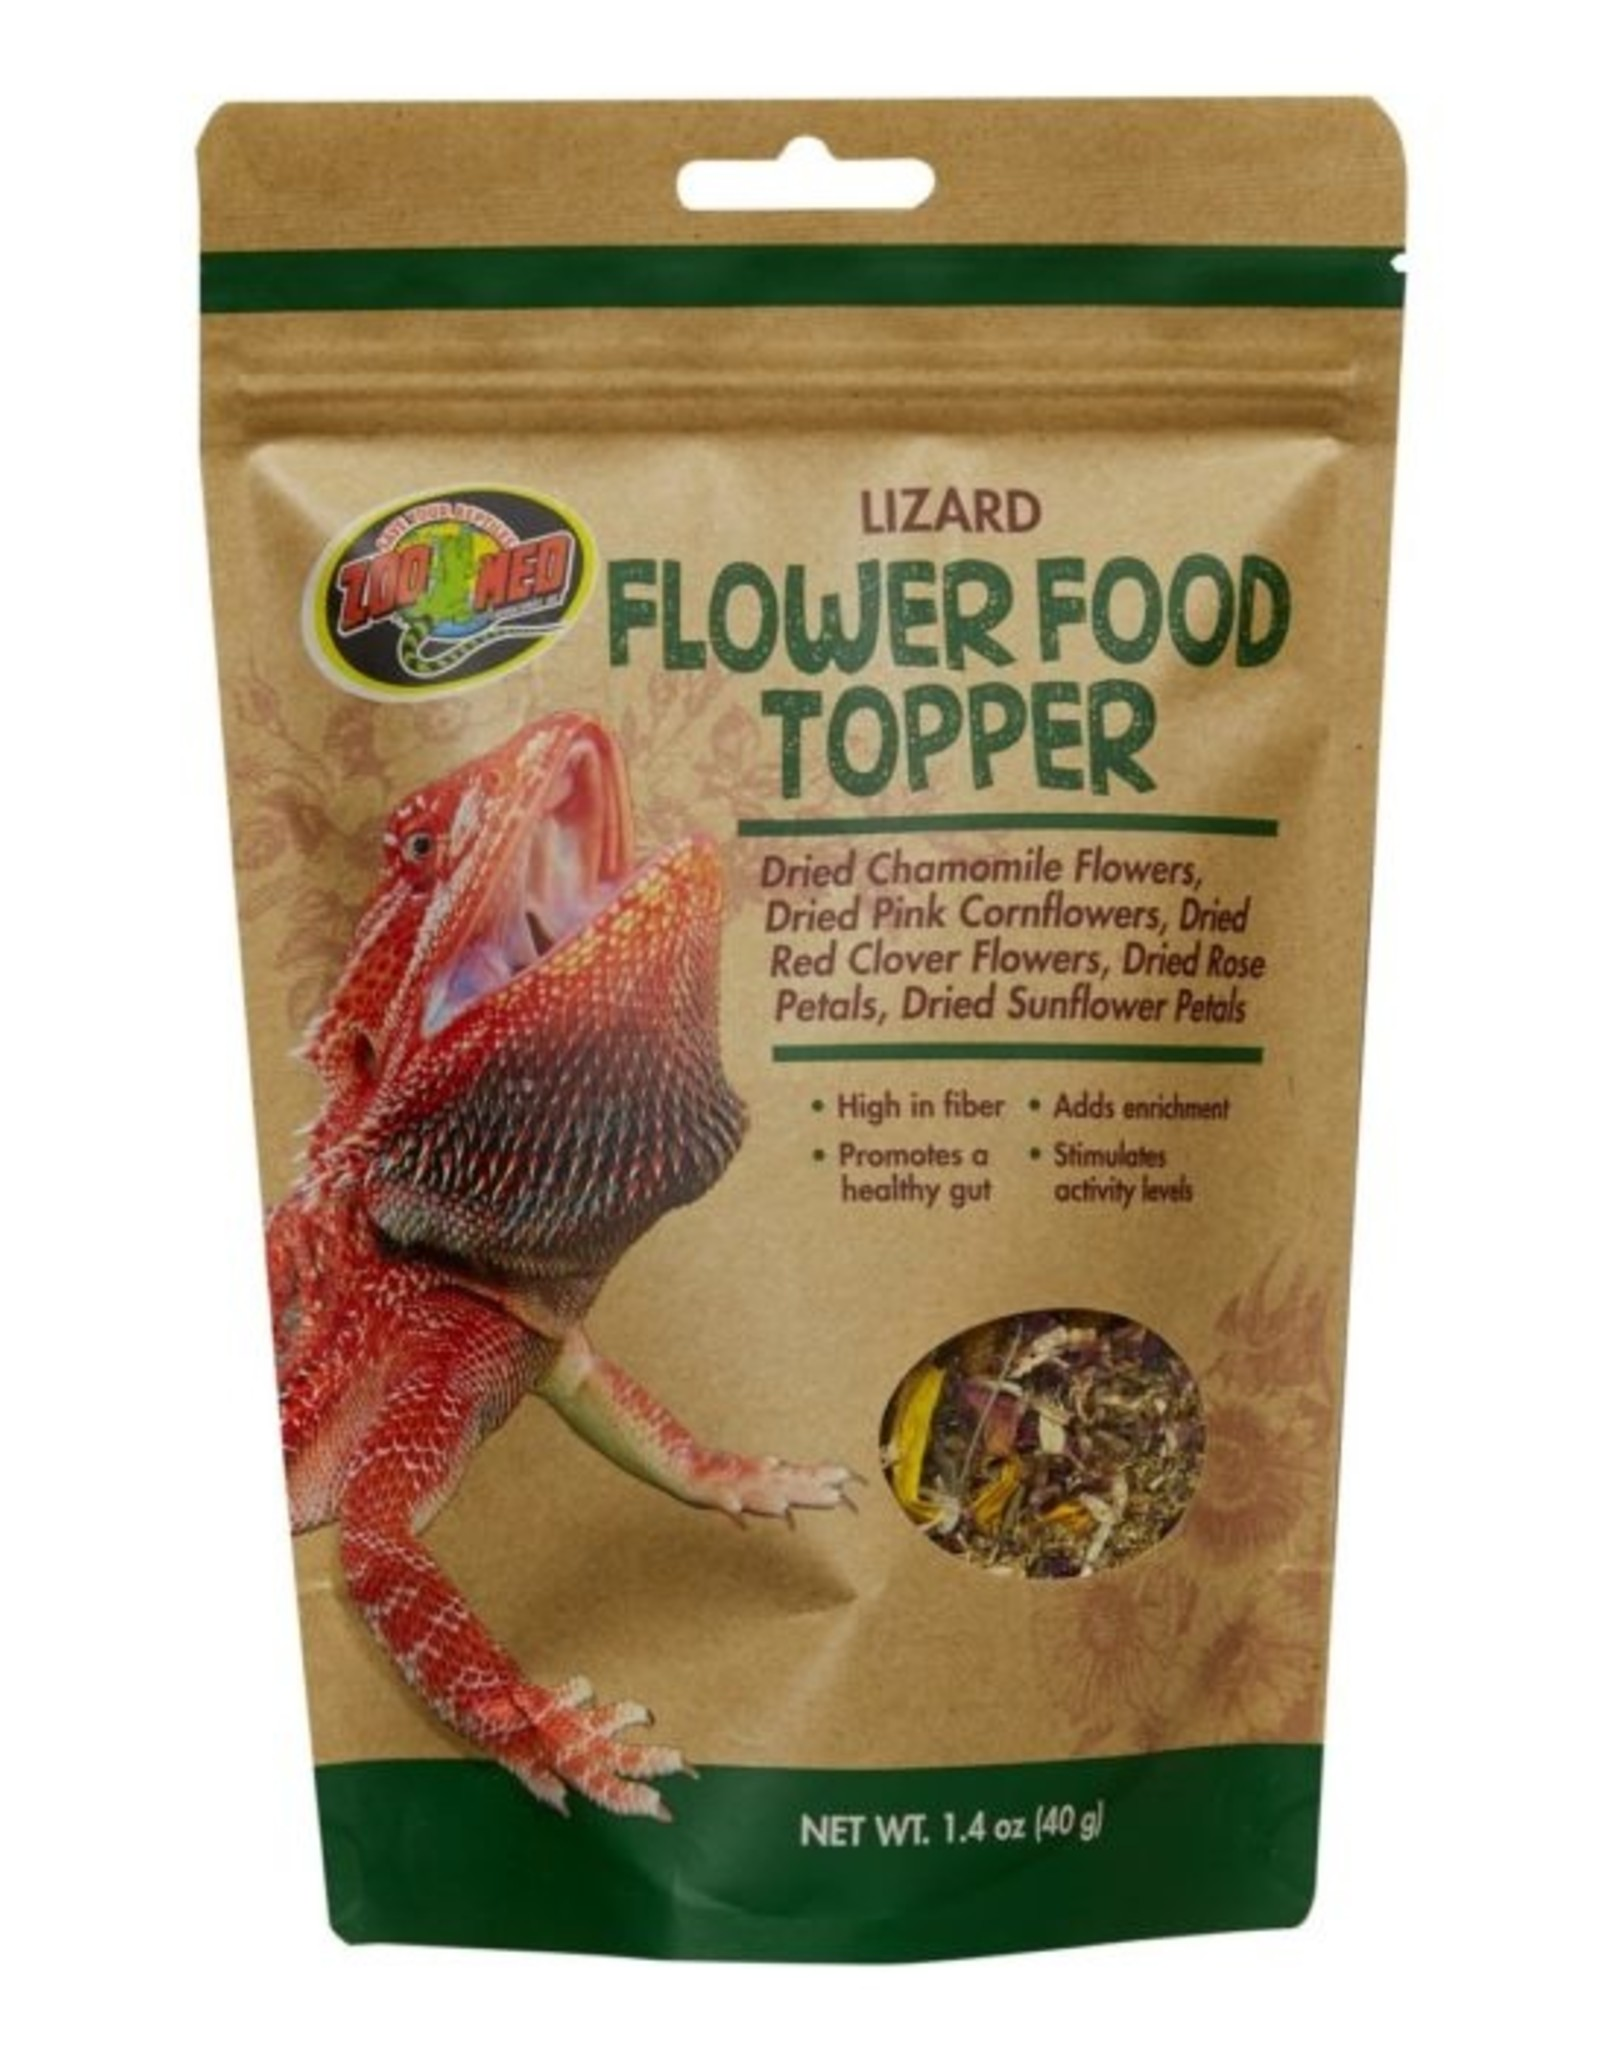 Zoo Med ZOO MED Lizard Flower Blend Food Topper